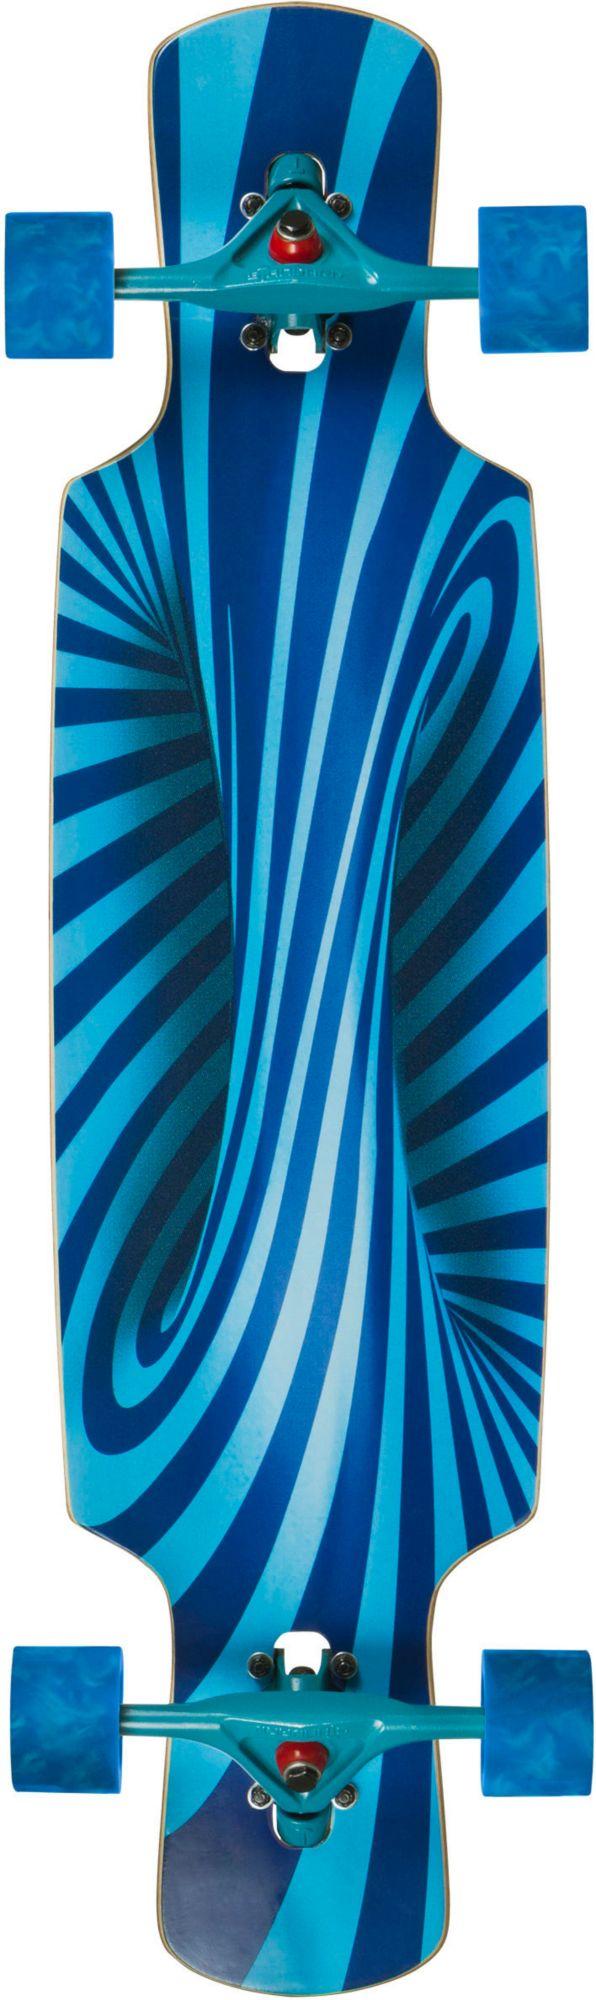 CHOKE Choke Longboard, blau, »Trick Lollipop Elite Dropthrough«